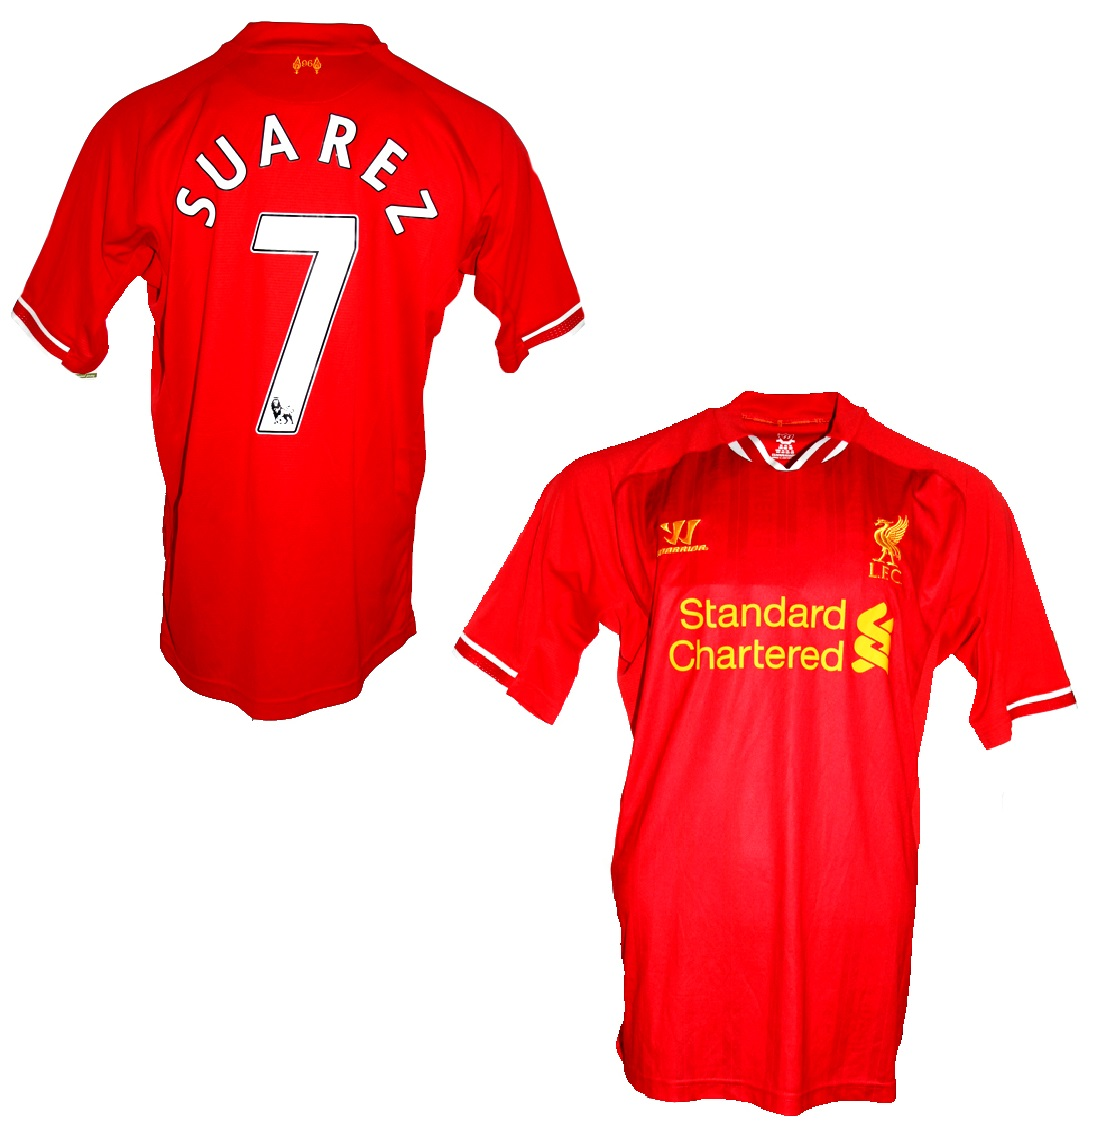 finest selection 2053b 3d456 Warrior FC Liverpool jersey 7 Luis Suárez 2013/14 home red ...